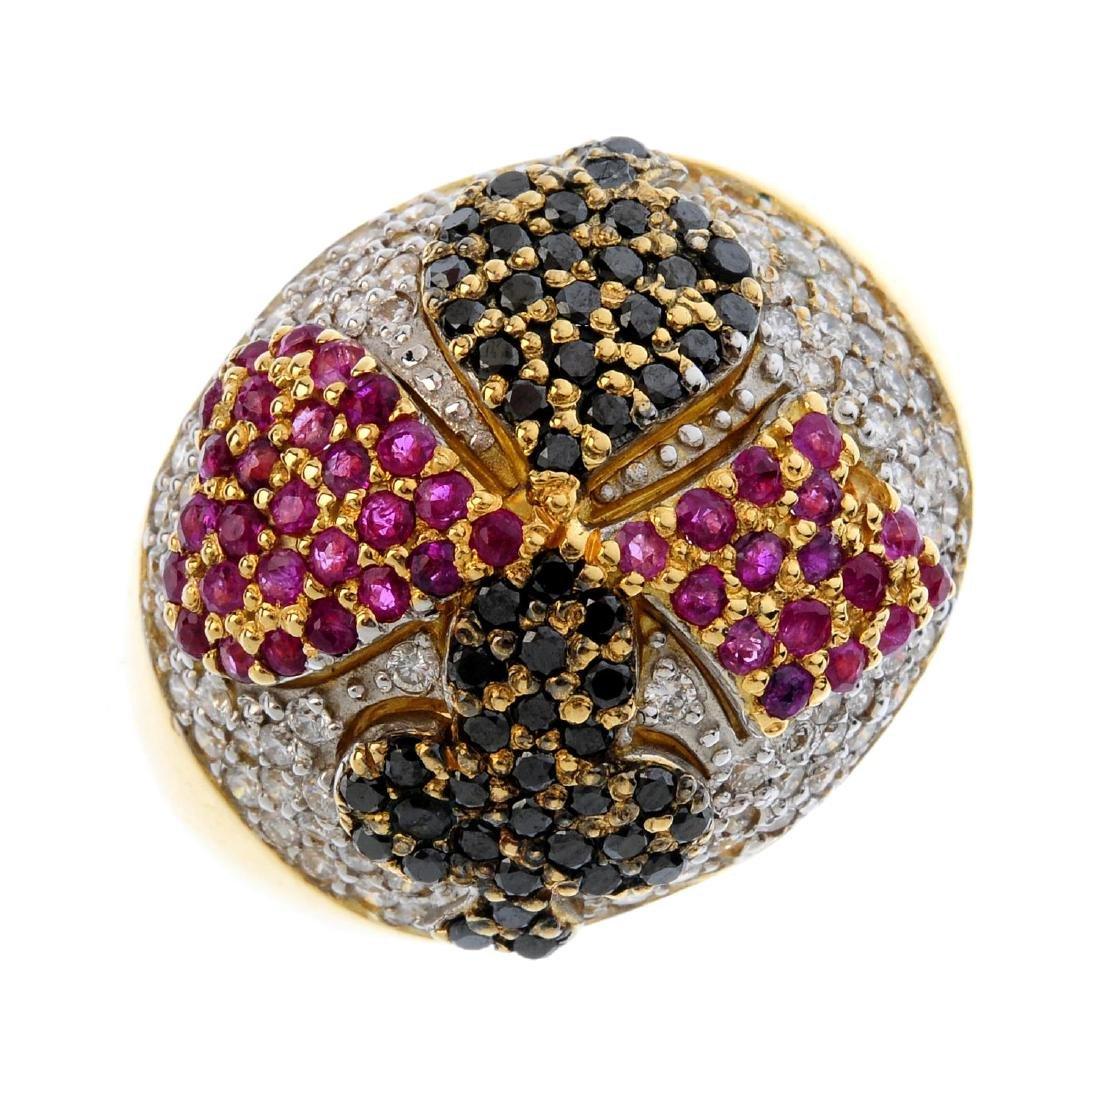 A diamond and gem-set ring. The pave-set diamond dome,